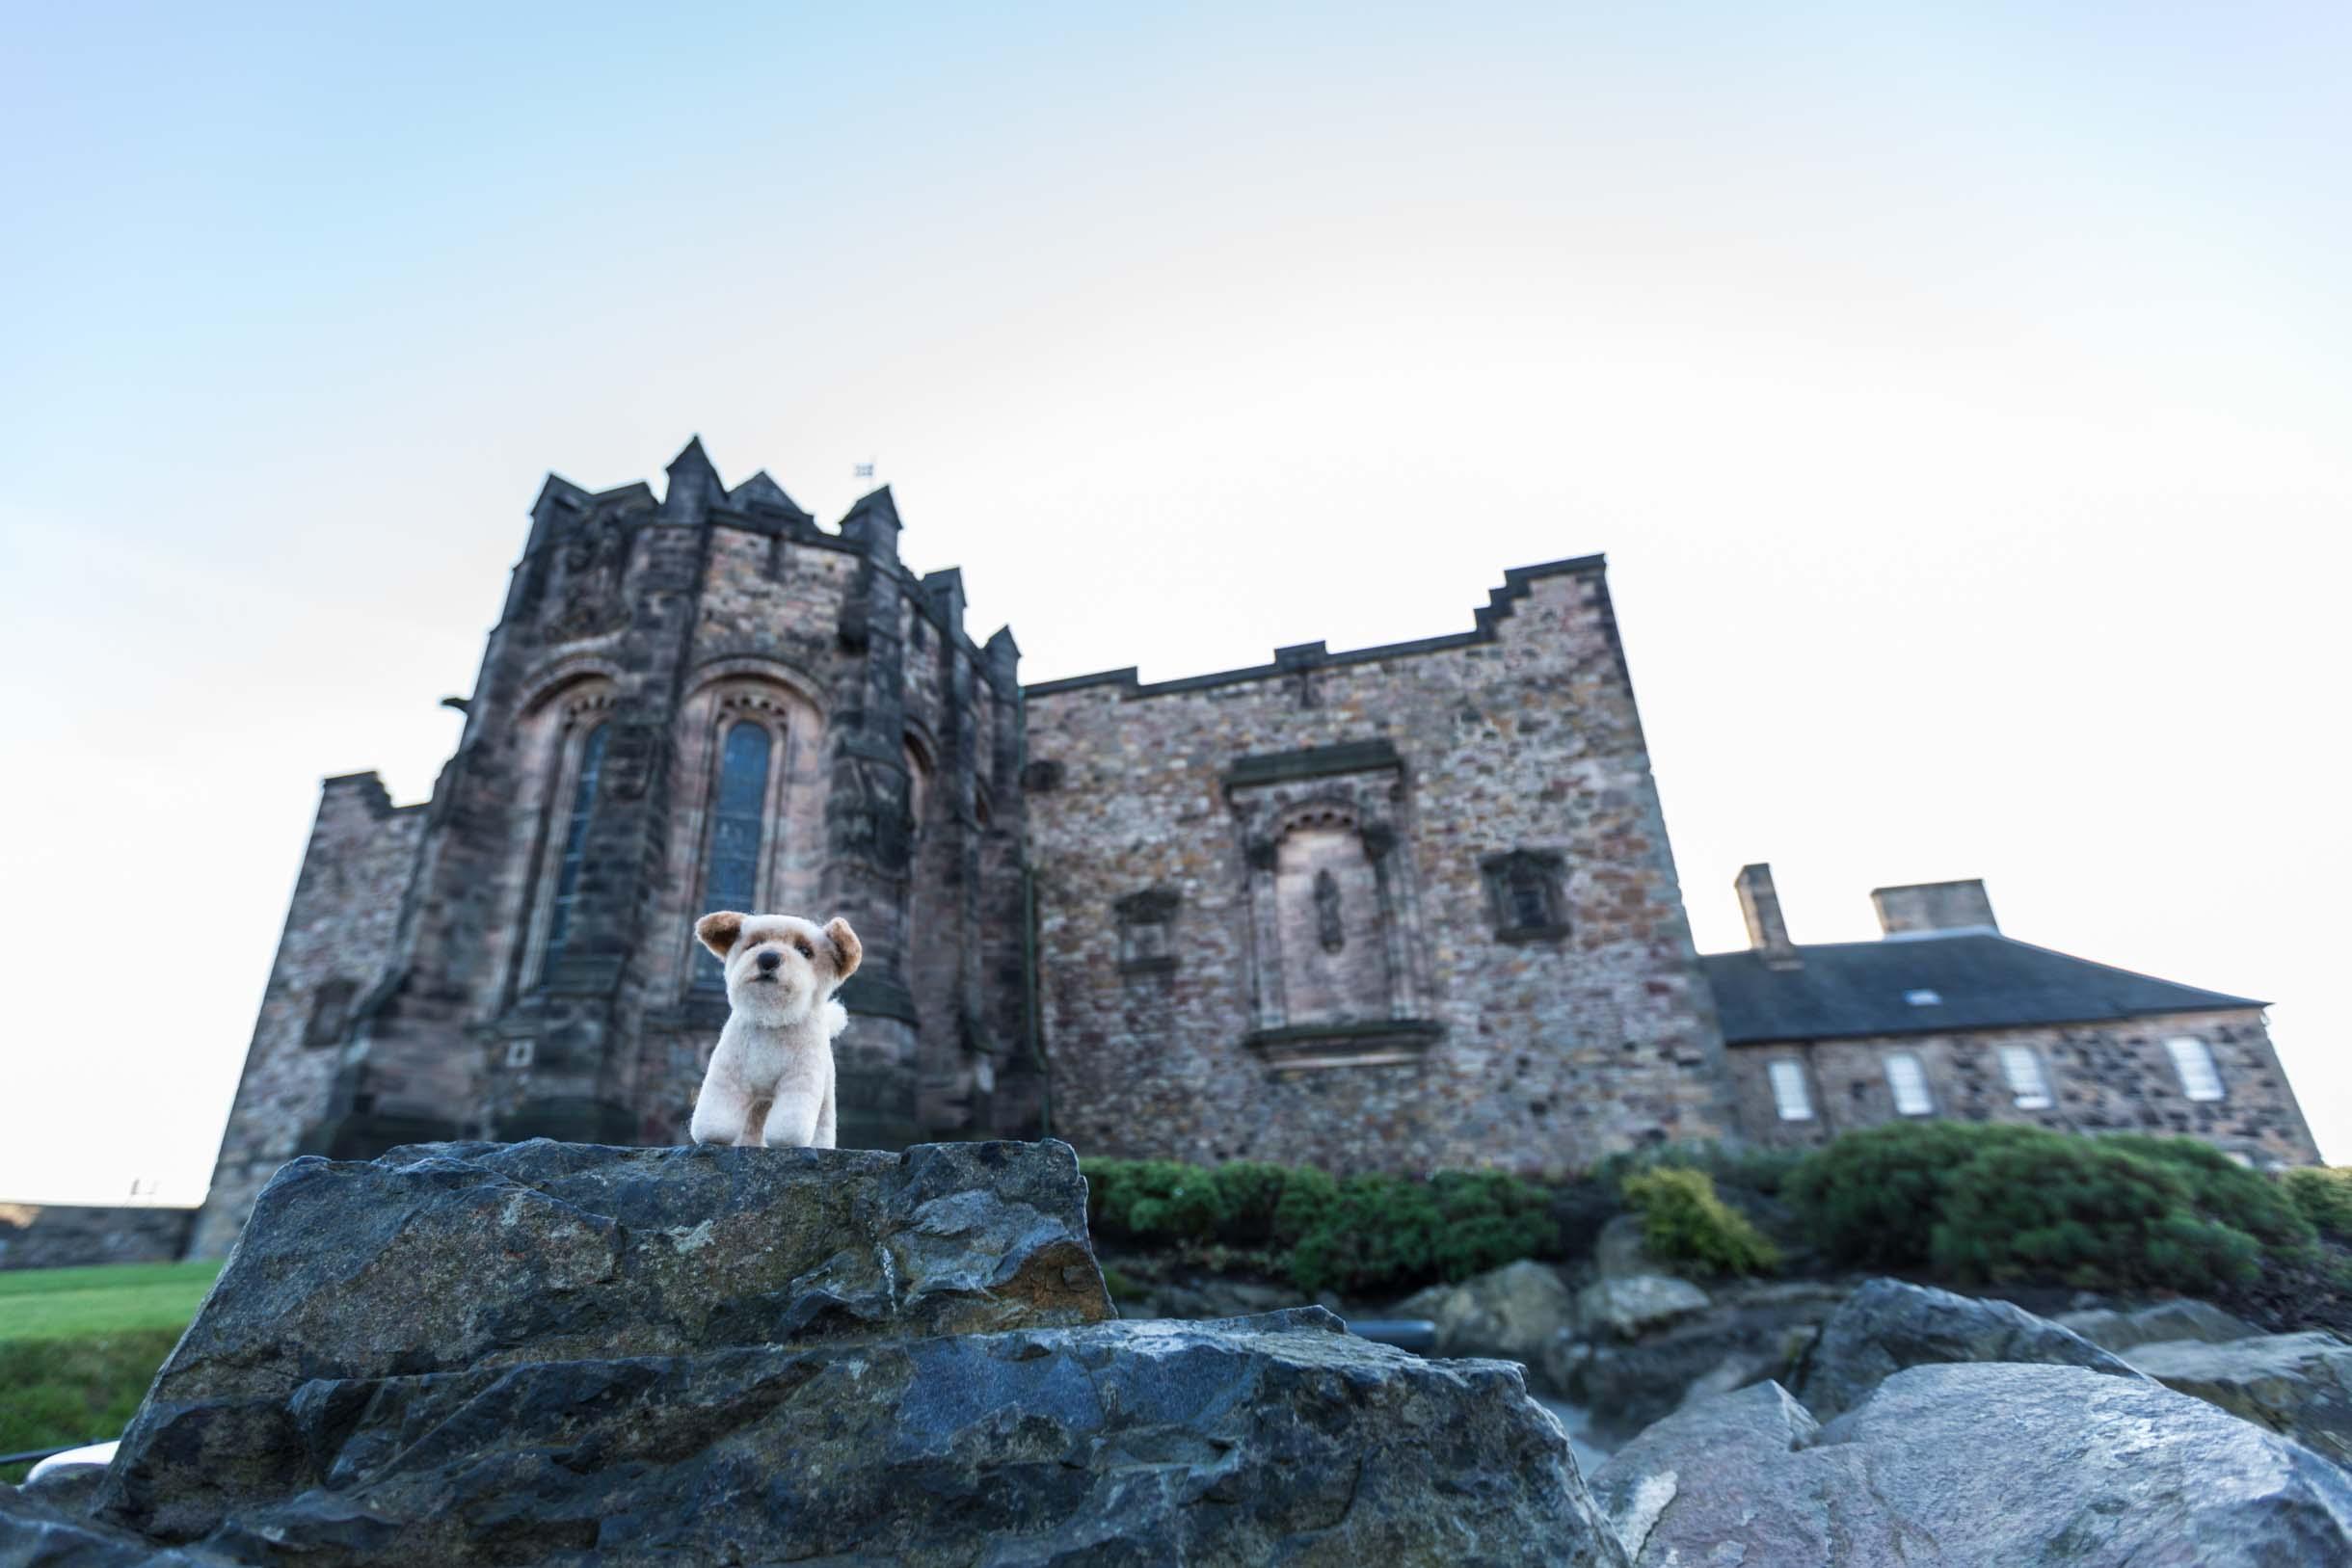 Picture Taken While Exploring Edinburgh - castle in edinburgh